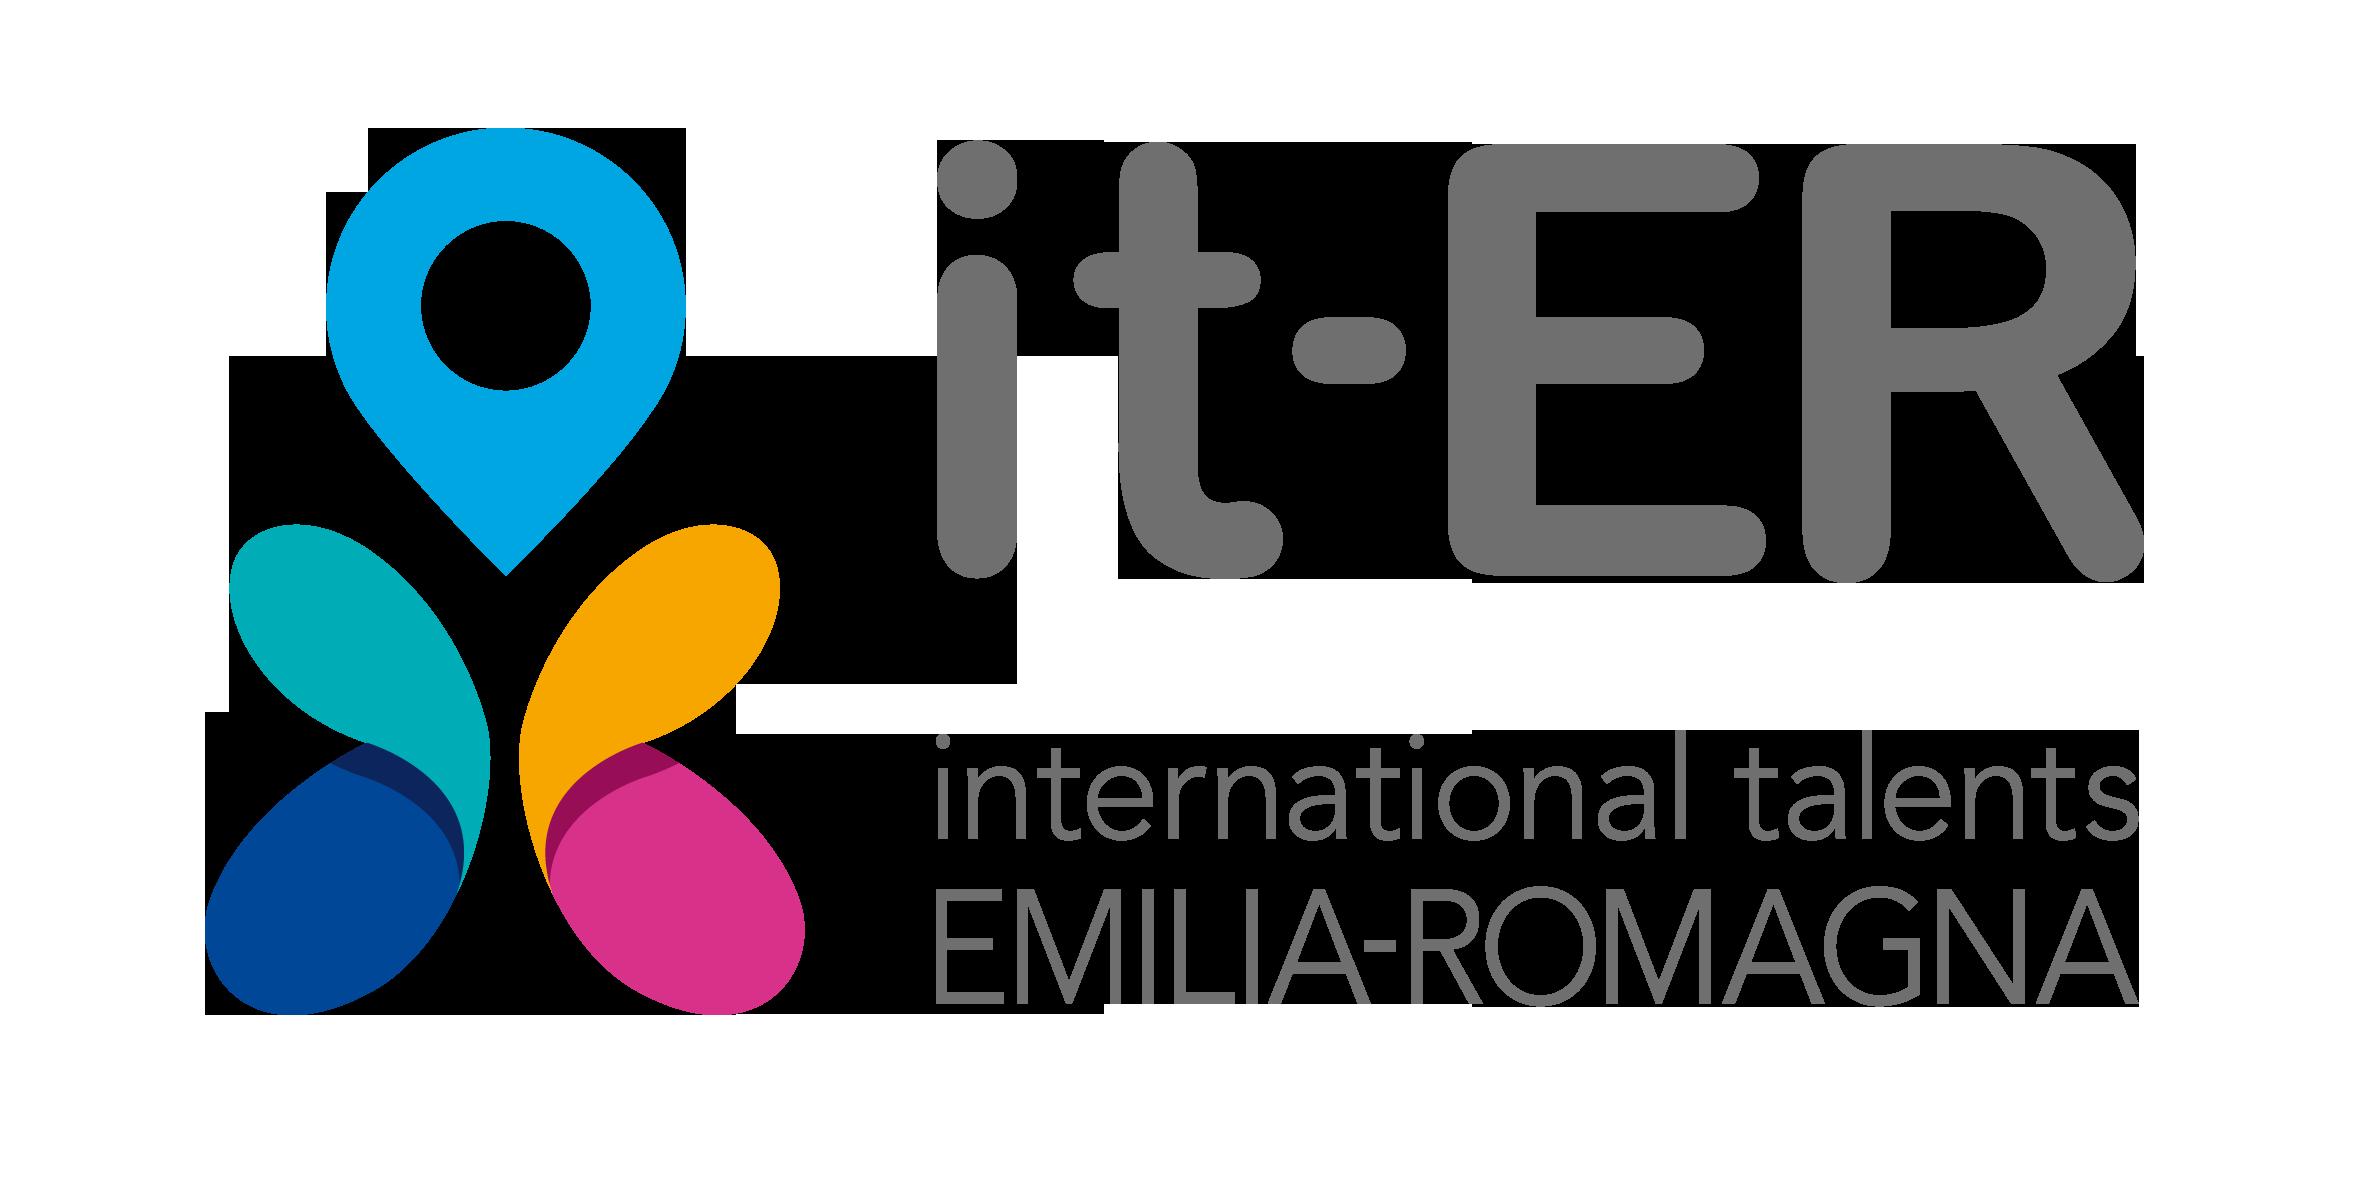 it-ER international talents EMILIA-ROMAGNA